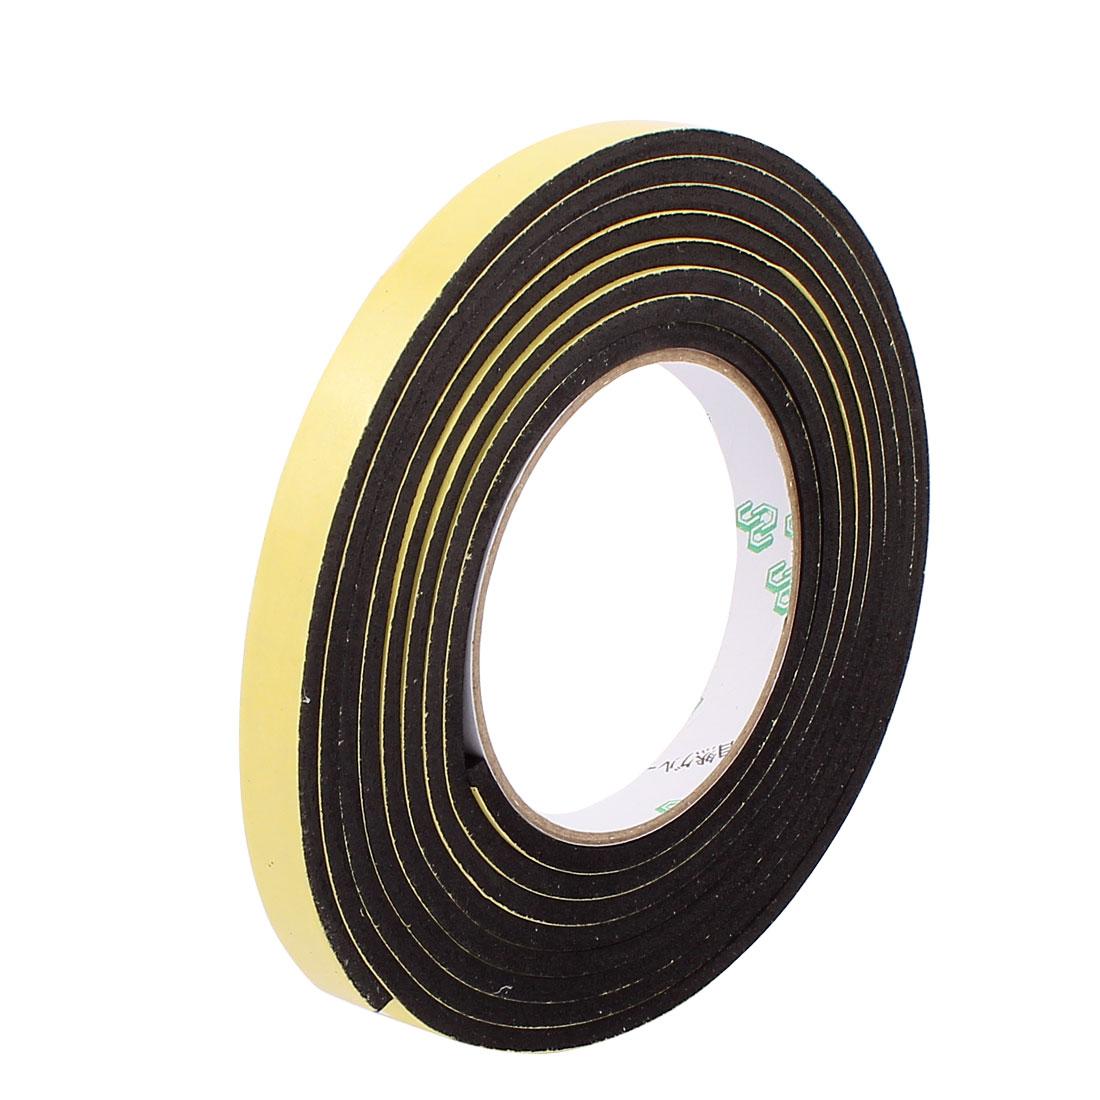 Black EVA 1.2CM Wide 3Meters Long 4MM Thick Single Sided Shockproof Sponge Tape